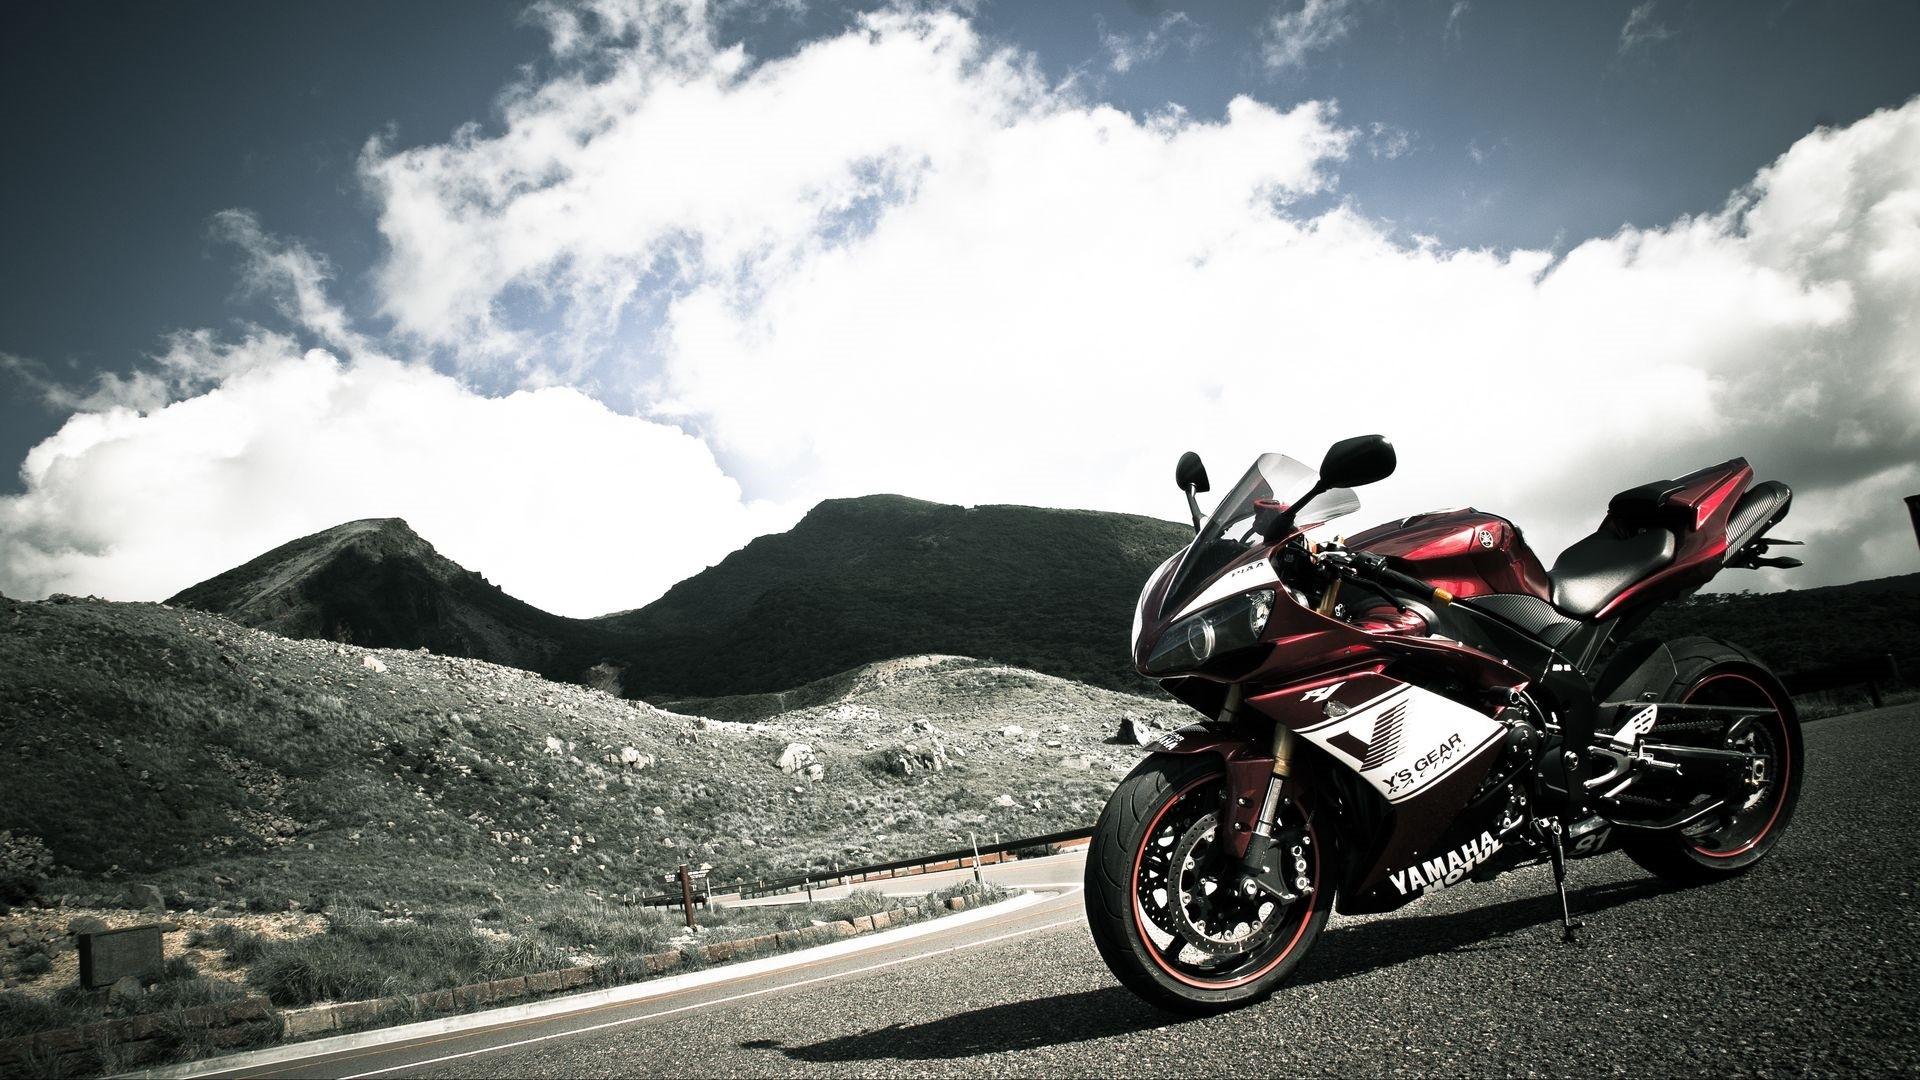 Motorcycle wallpaper photo hd